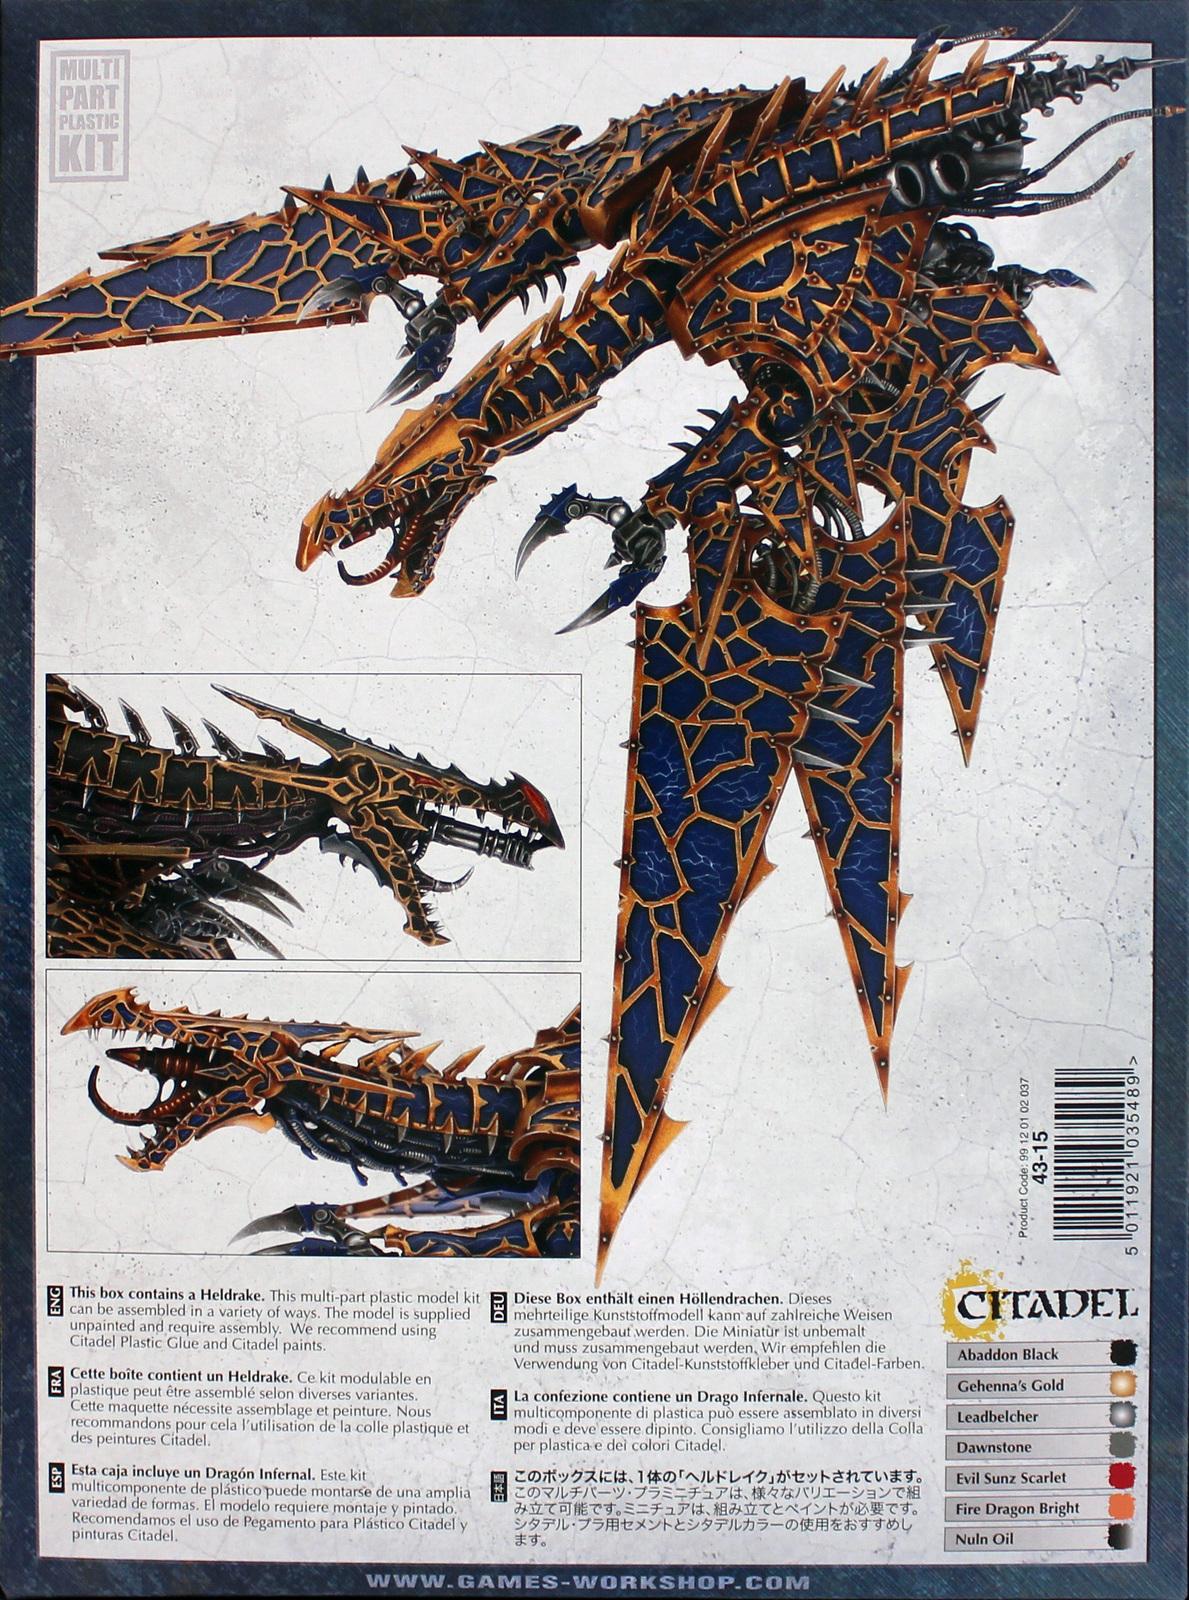 Warhammer 40,000 Chaos Space Marine Heldrake image